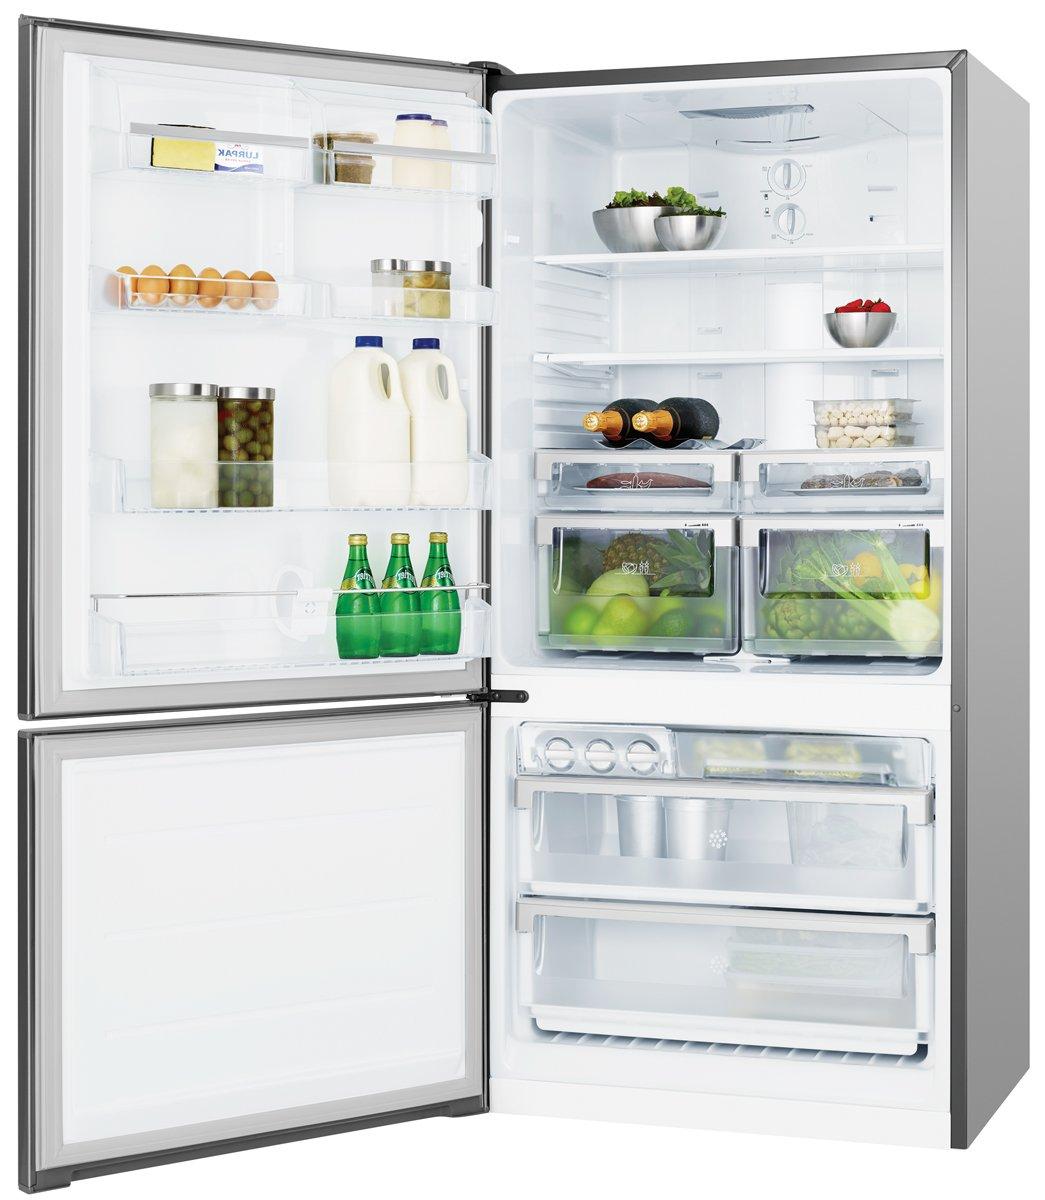 electrolux 510l fridge electrolux ebm5100sdl 510l bottom mount fridge product video 510l fridge w